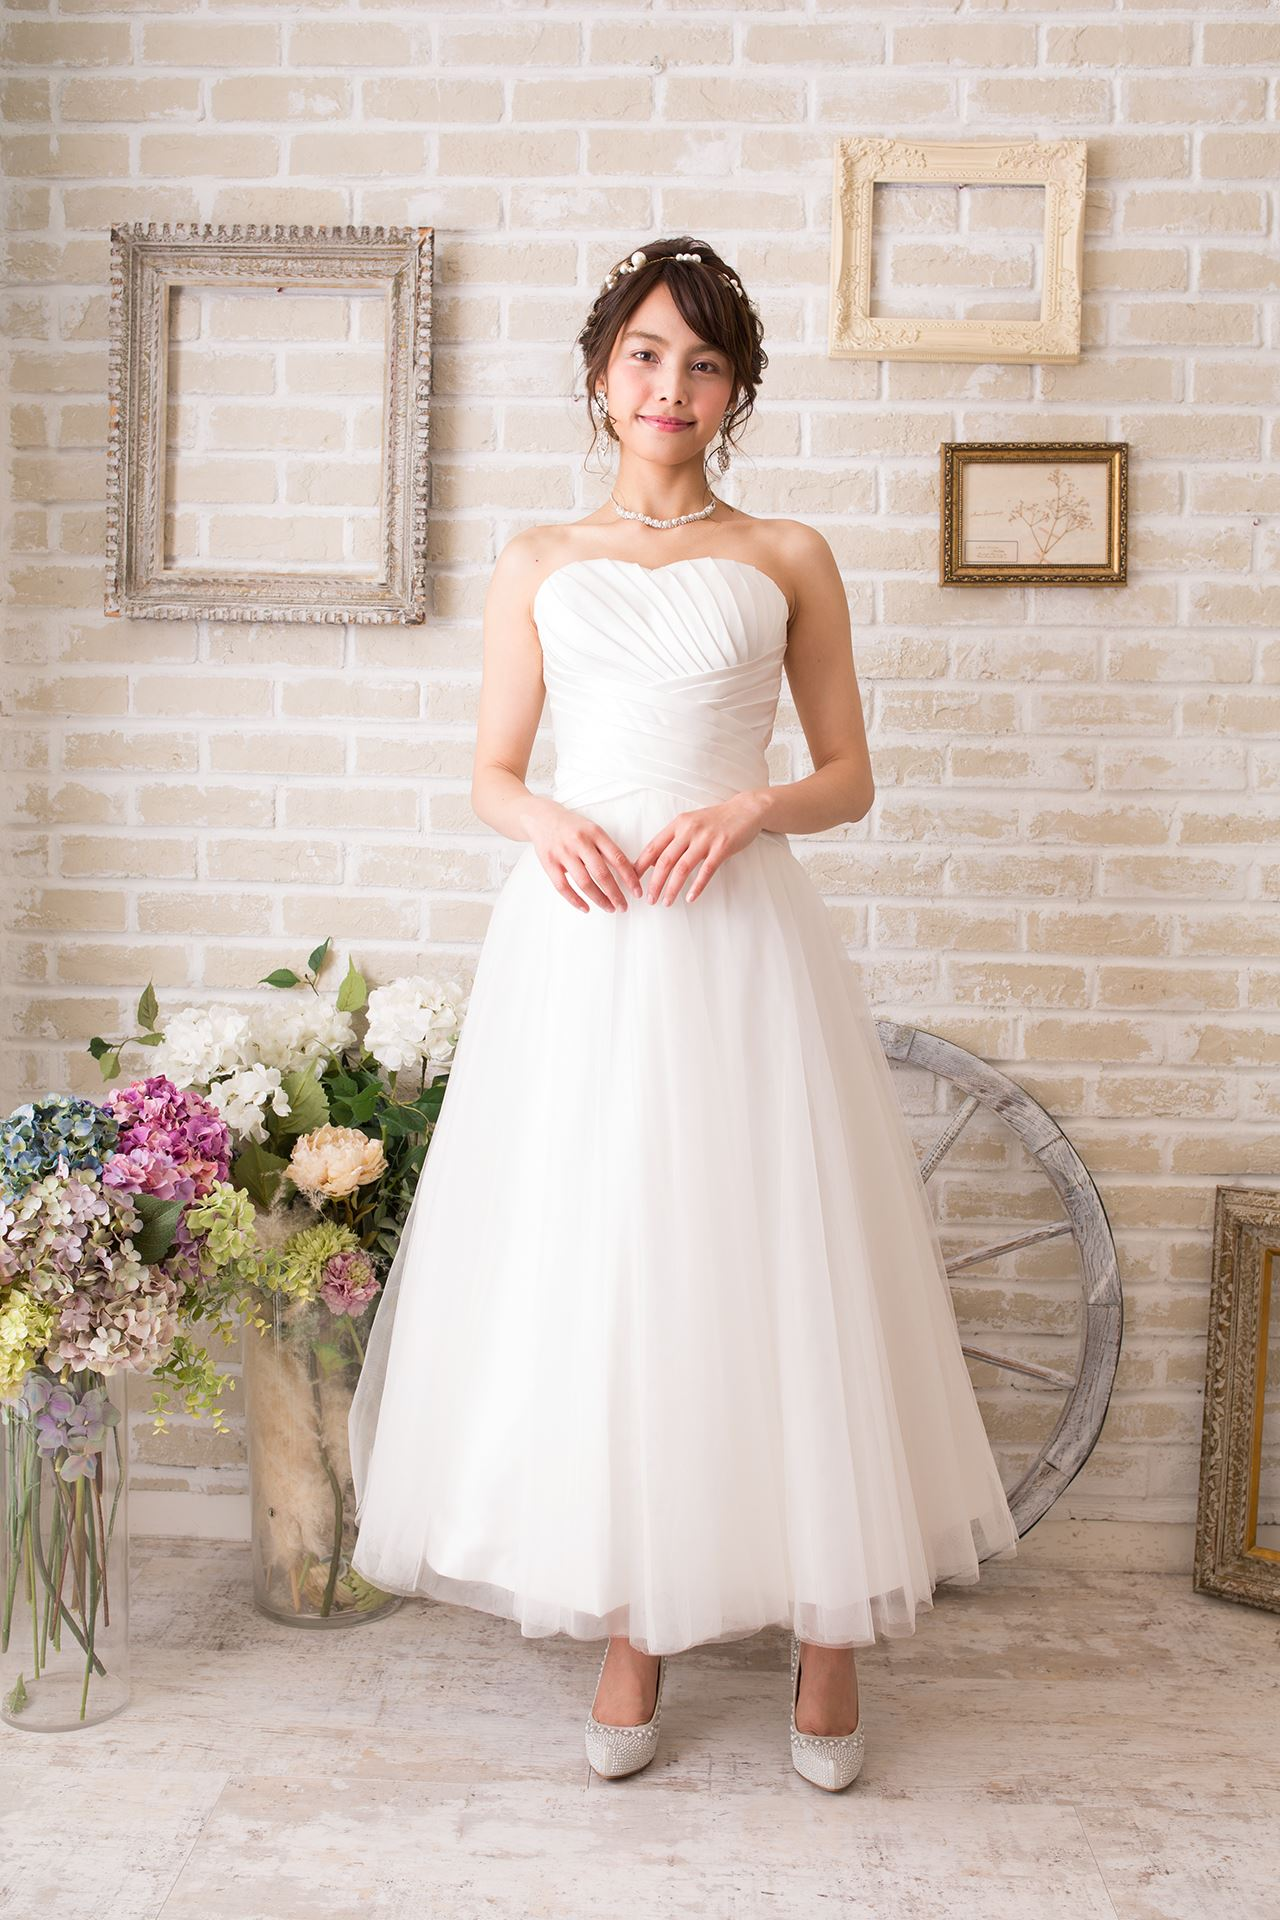 yk_nr_dress_382